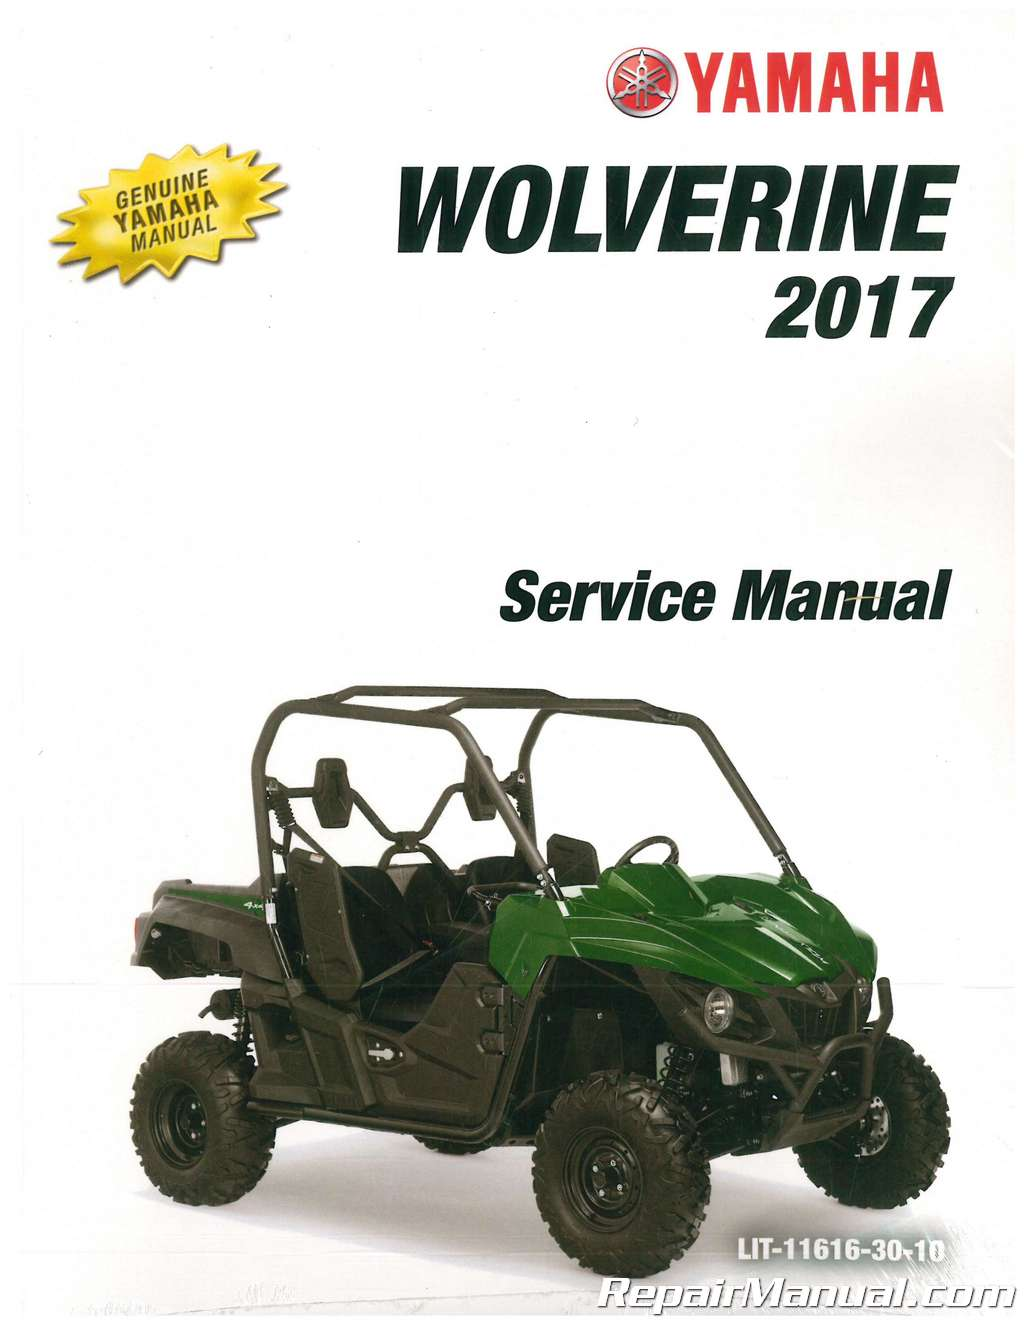 2017 yamaha wolverine 700 atv service manual rh repairmanual com yamaha wolverine manual pdf yamaha wolverine manual clutch